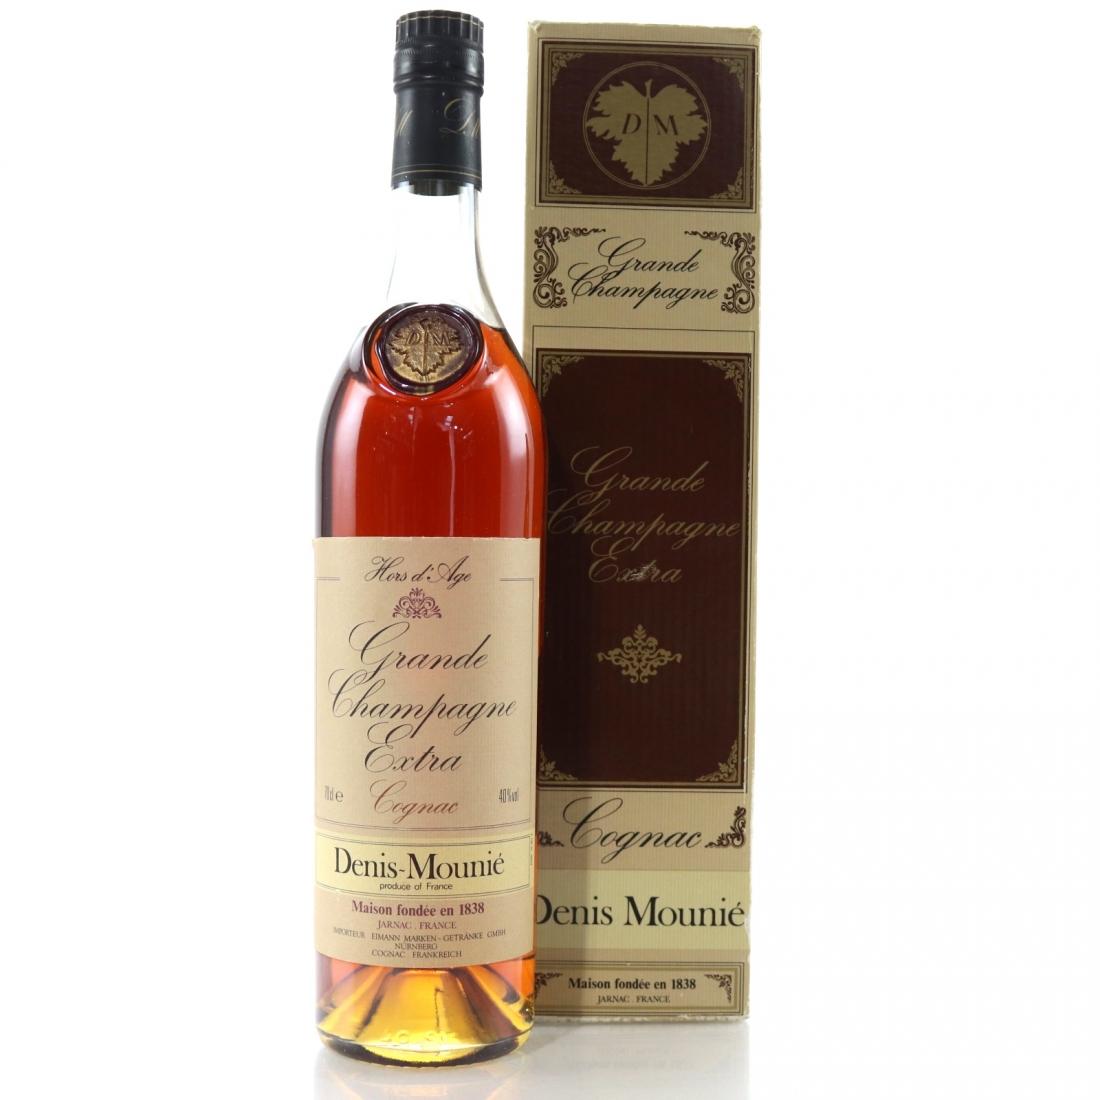 Denis-Mounie Hors d'Age Grande Champagne Extra Cognac